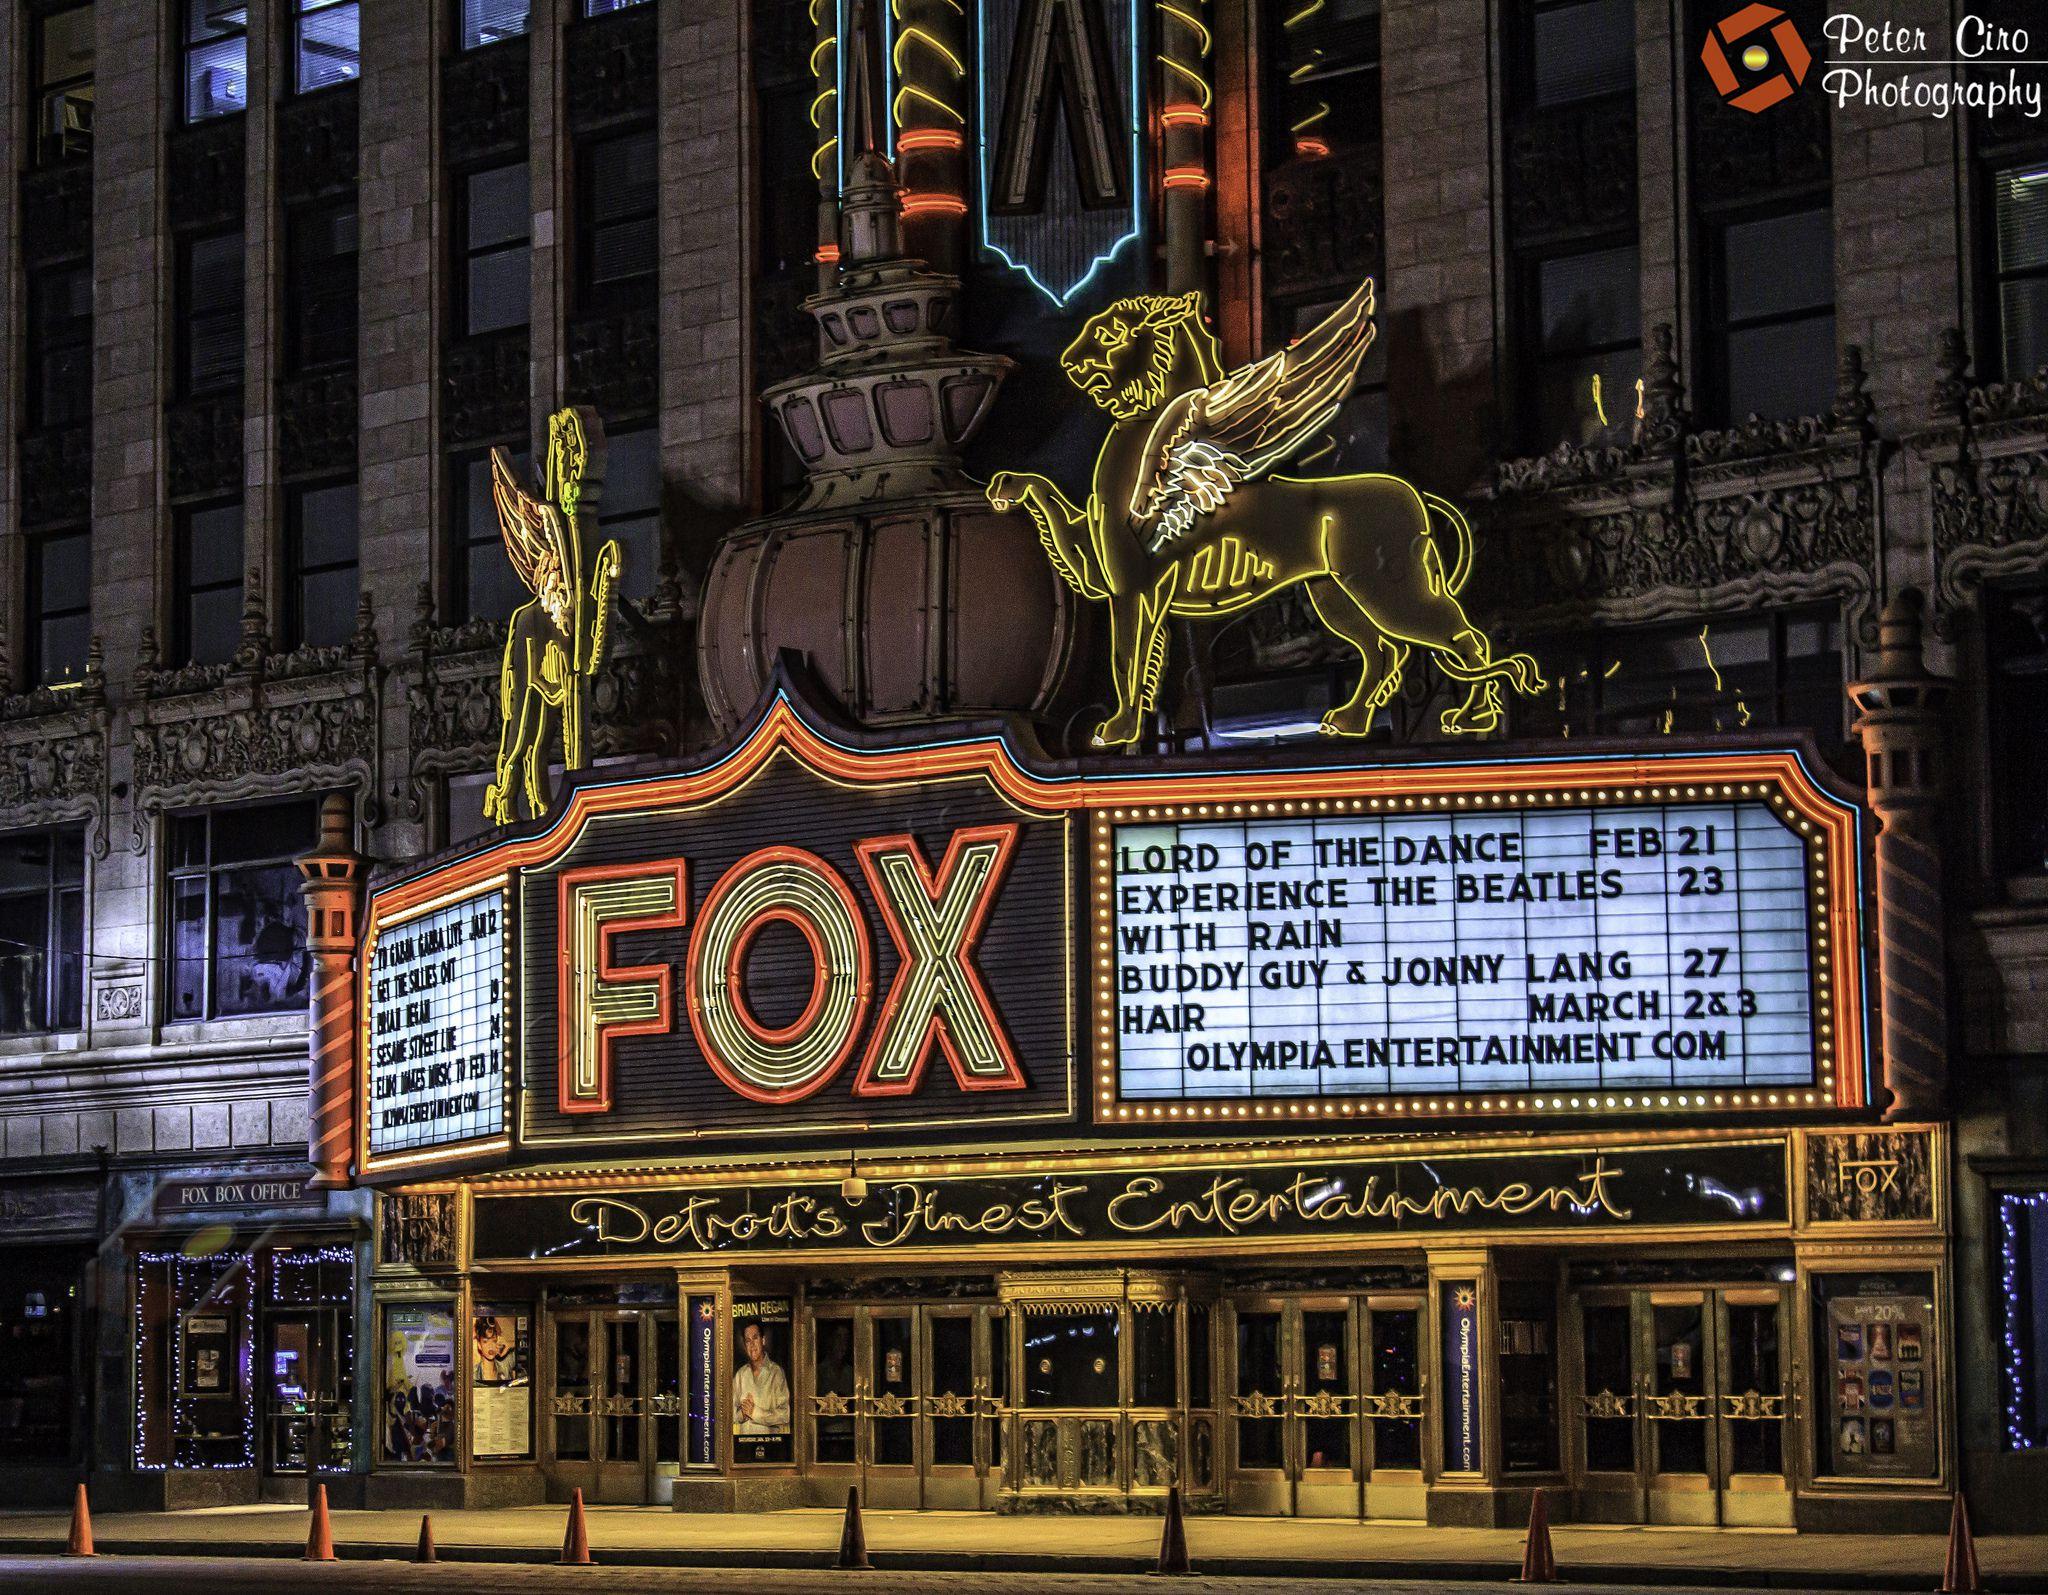 The Best Concert Venues in Detroit